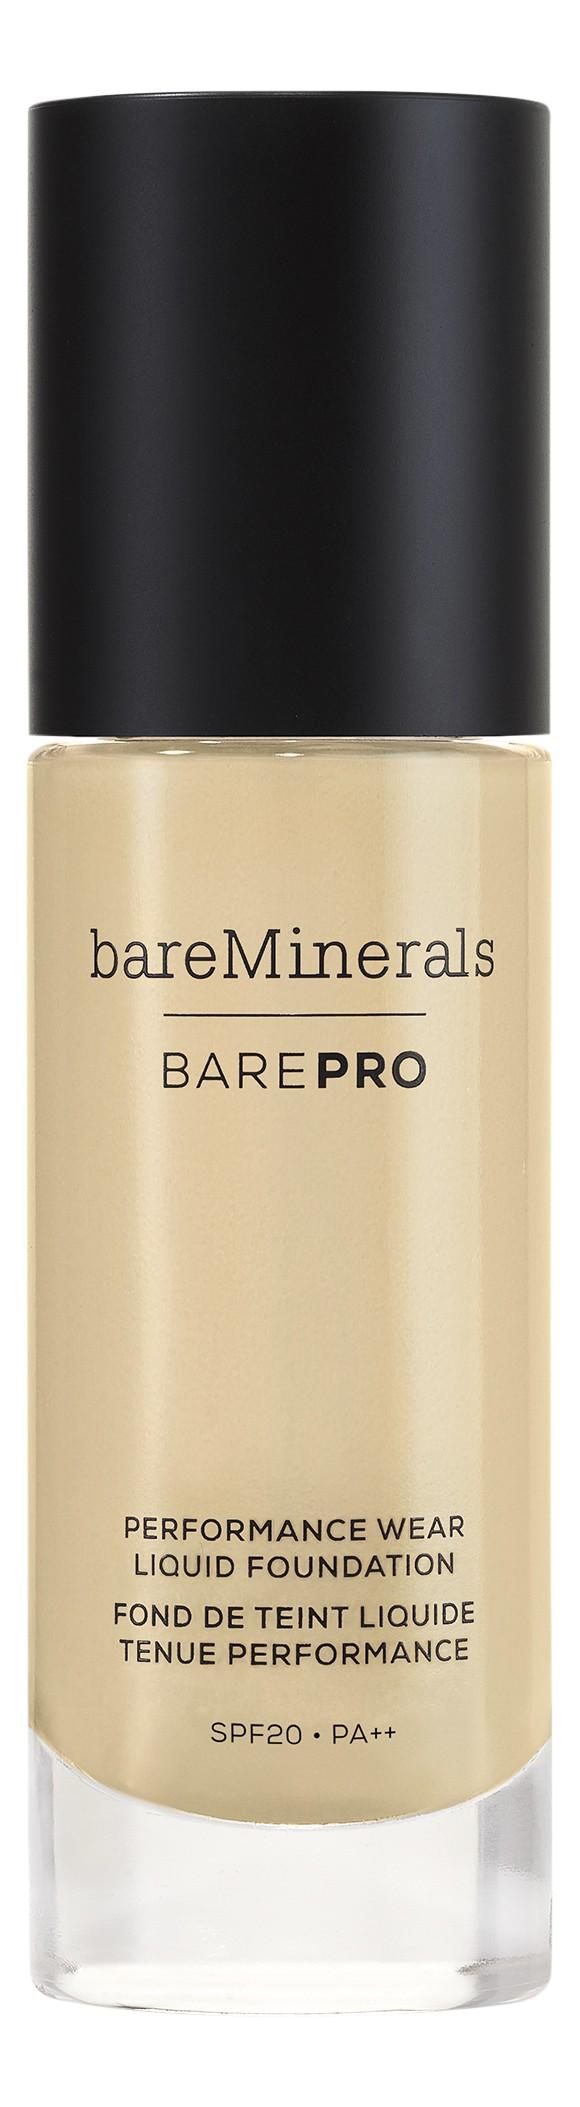 bareMinerals - Barepro Performance Wear Liquid Foundation - Aspen 04